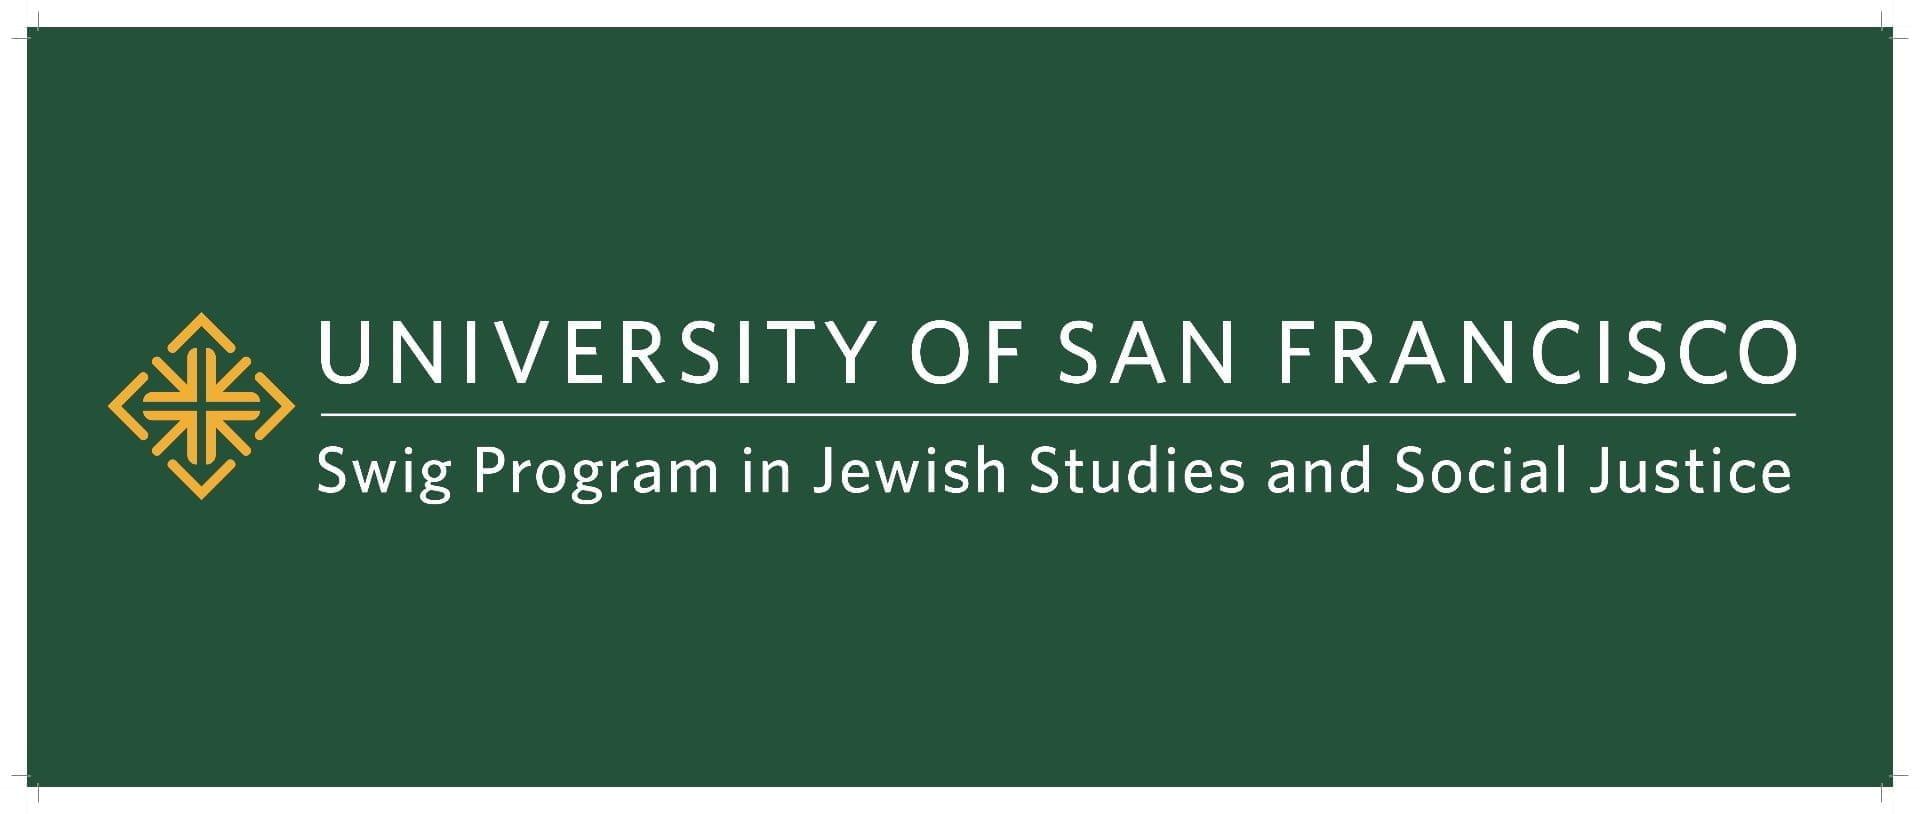 University of San Francisco - Swig Program in Jewish Studies and Social Justice